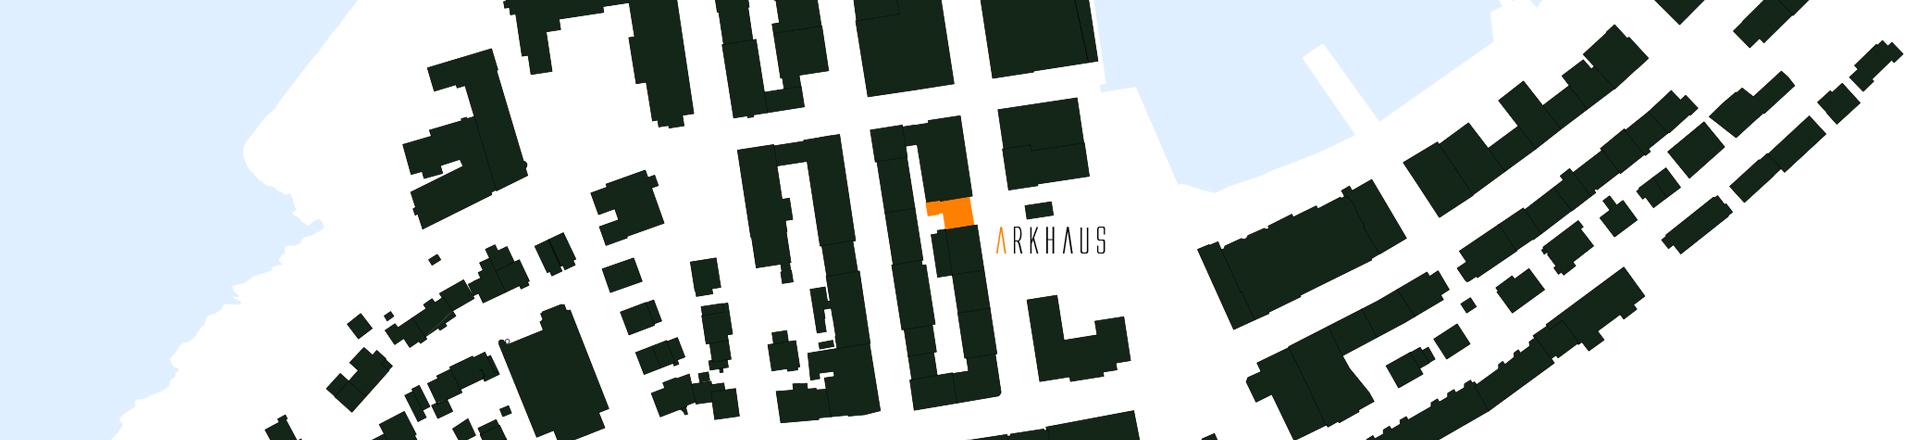 Studio_kart_arkhaus